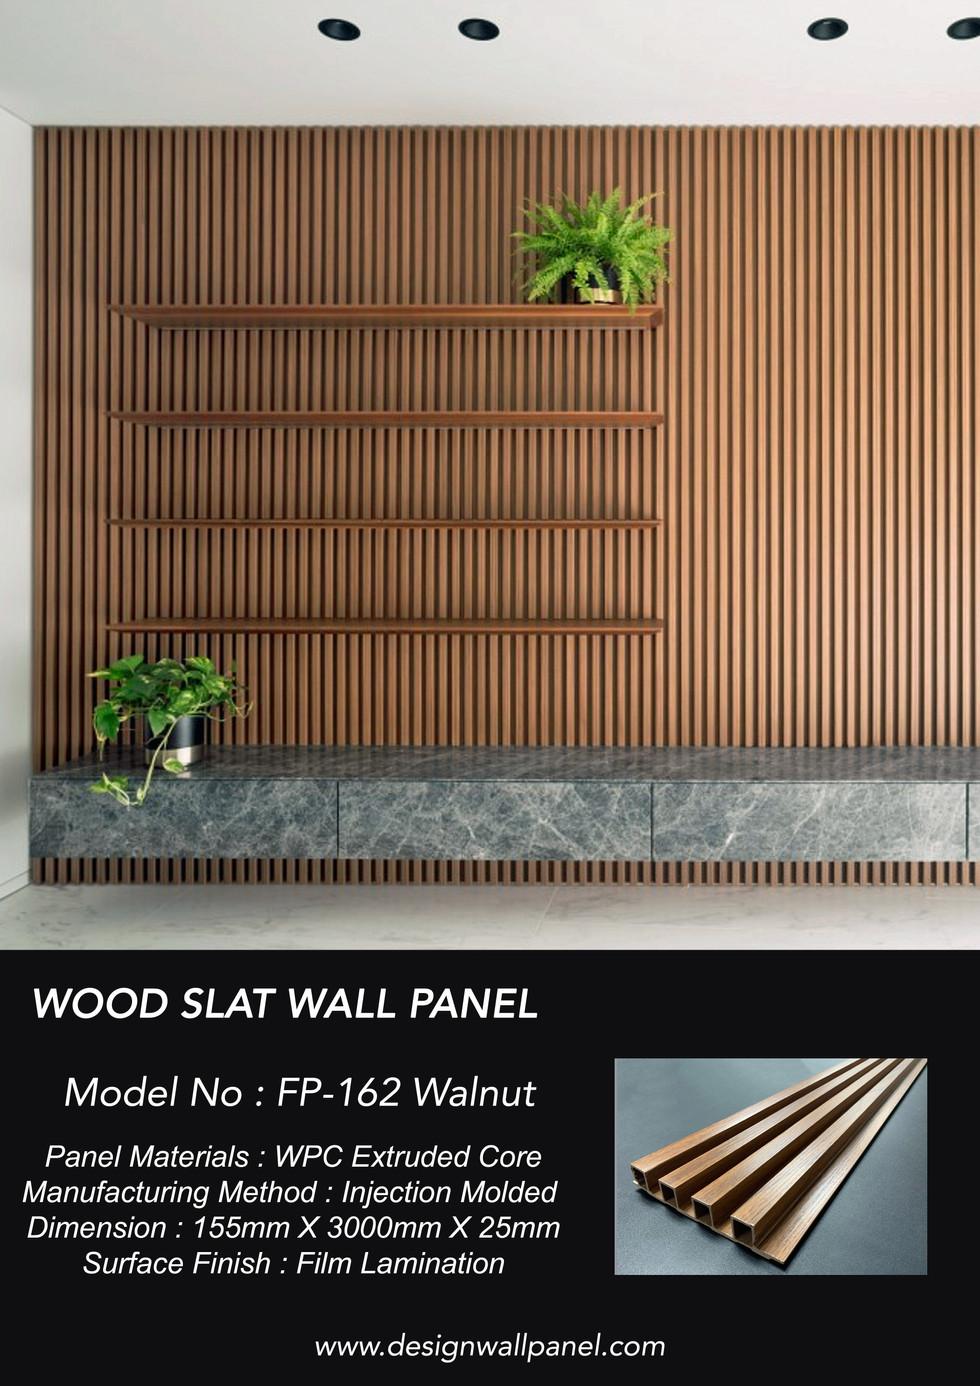 wood slat wall panel FP-162 walnut .jpg